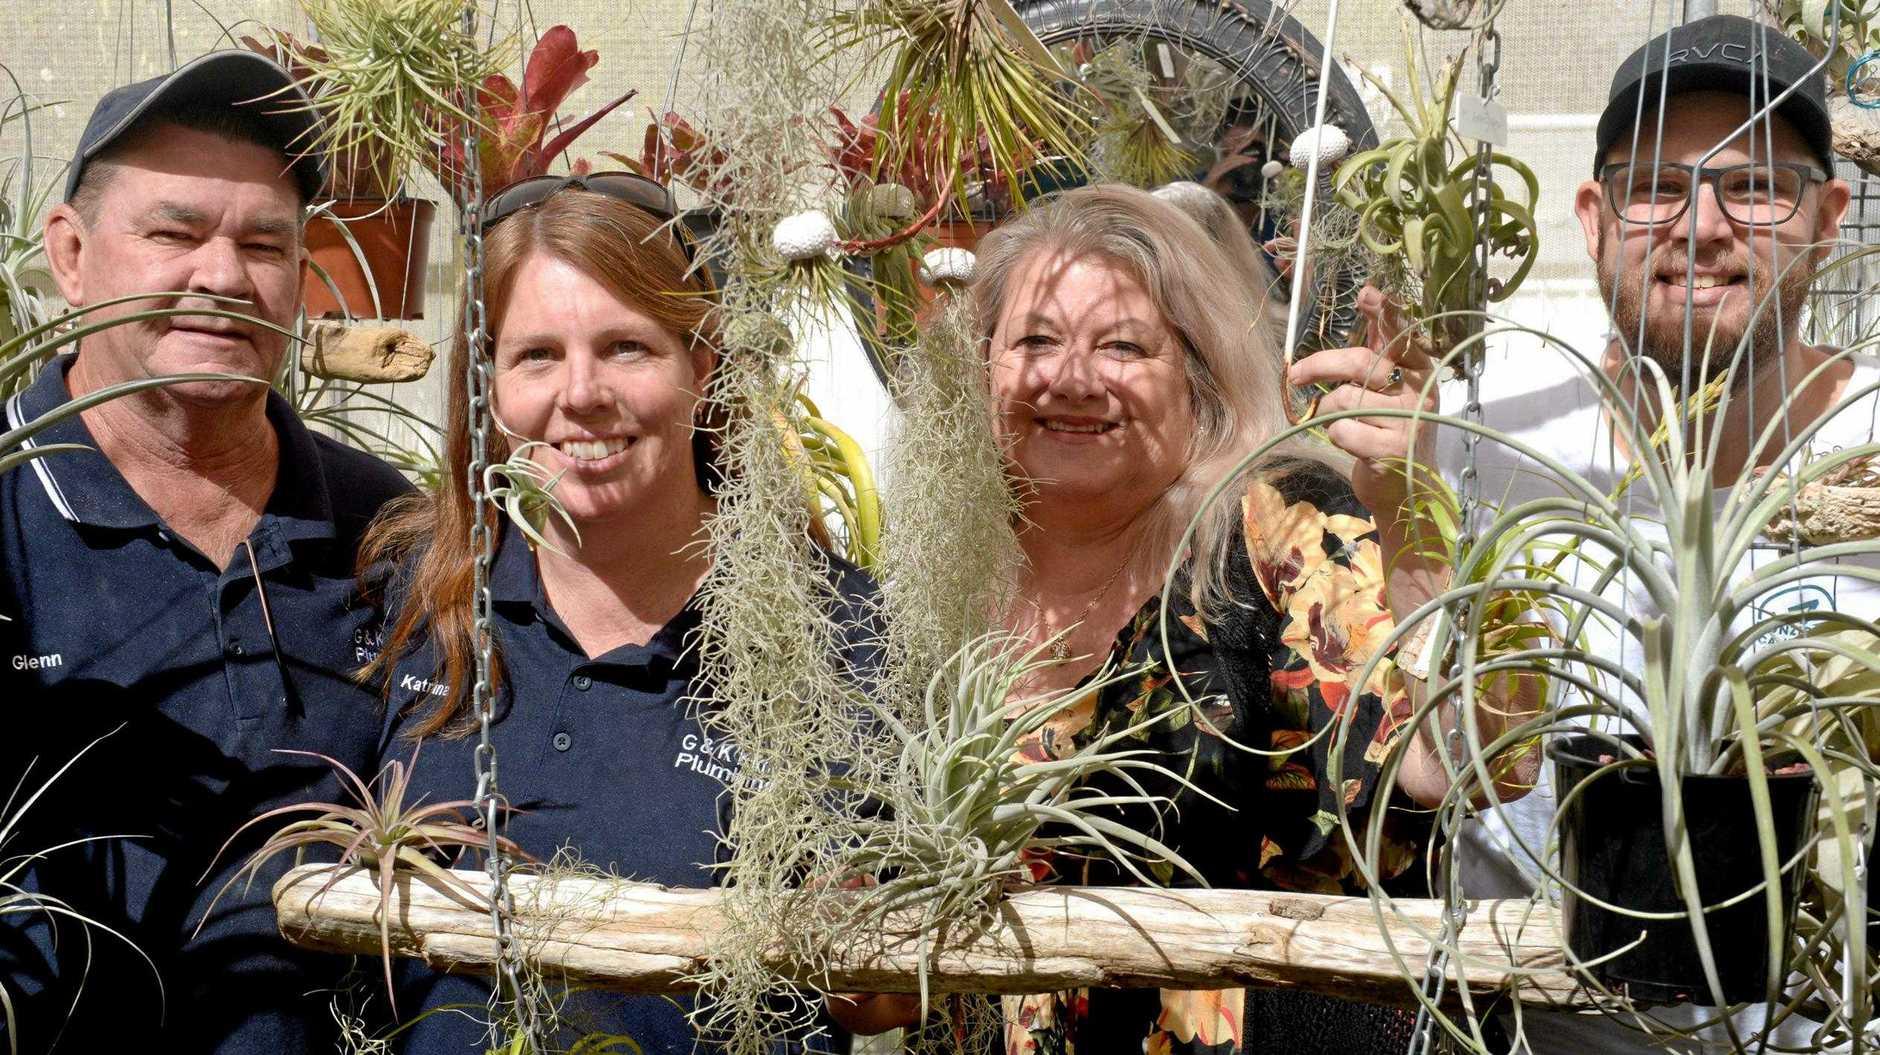 Glenn and Katrina Kime, Glenda Thompson and Jamie Shaw prepare for the Bromeliad Group's first sale in Rockhampton